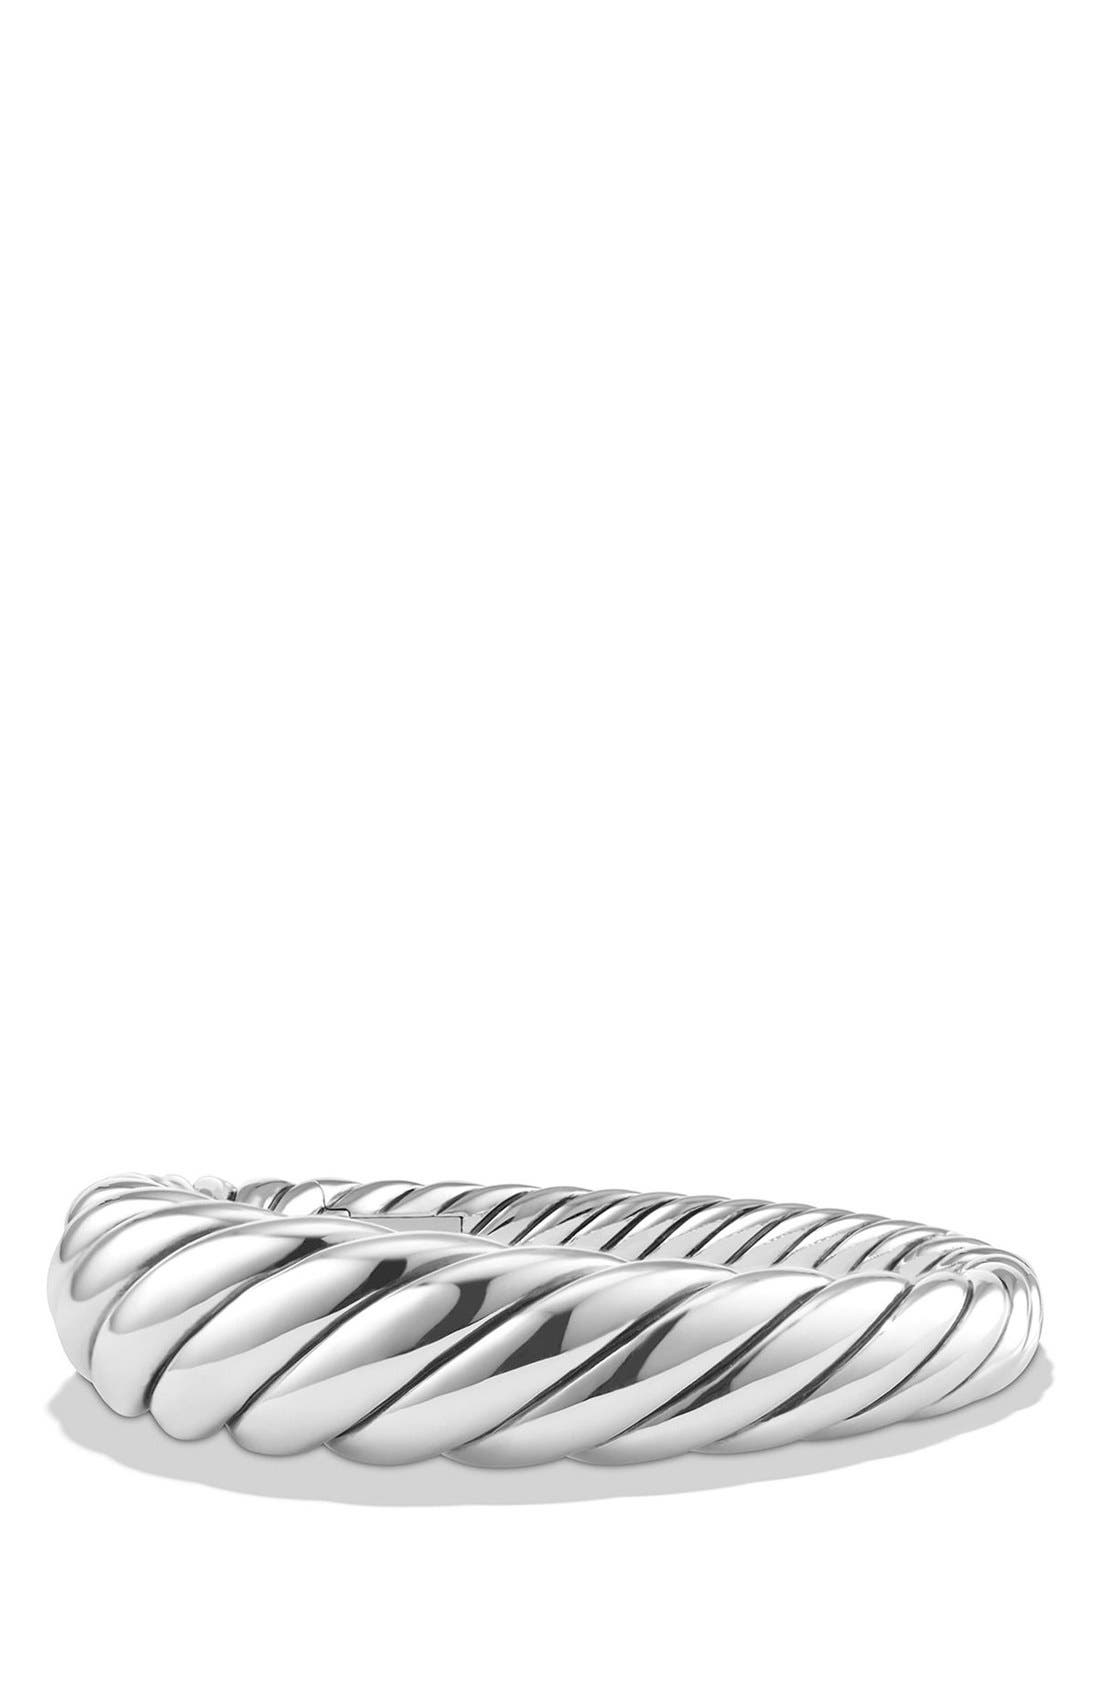 David Yurman 'Pure Form' Cable Bracelet